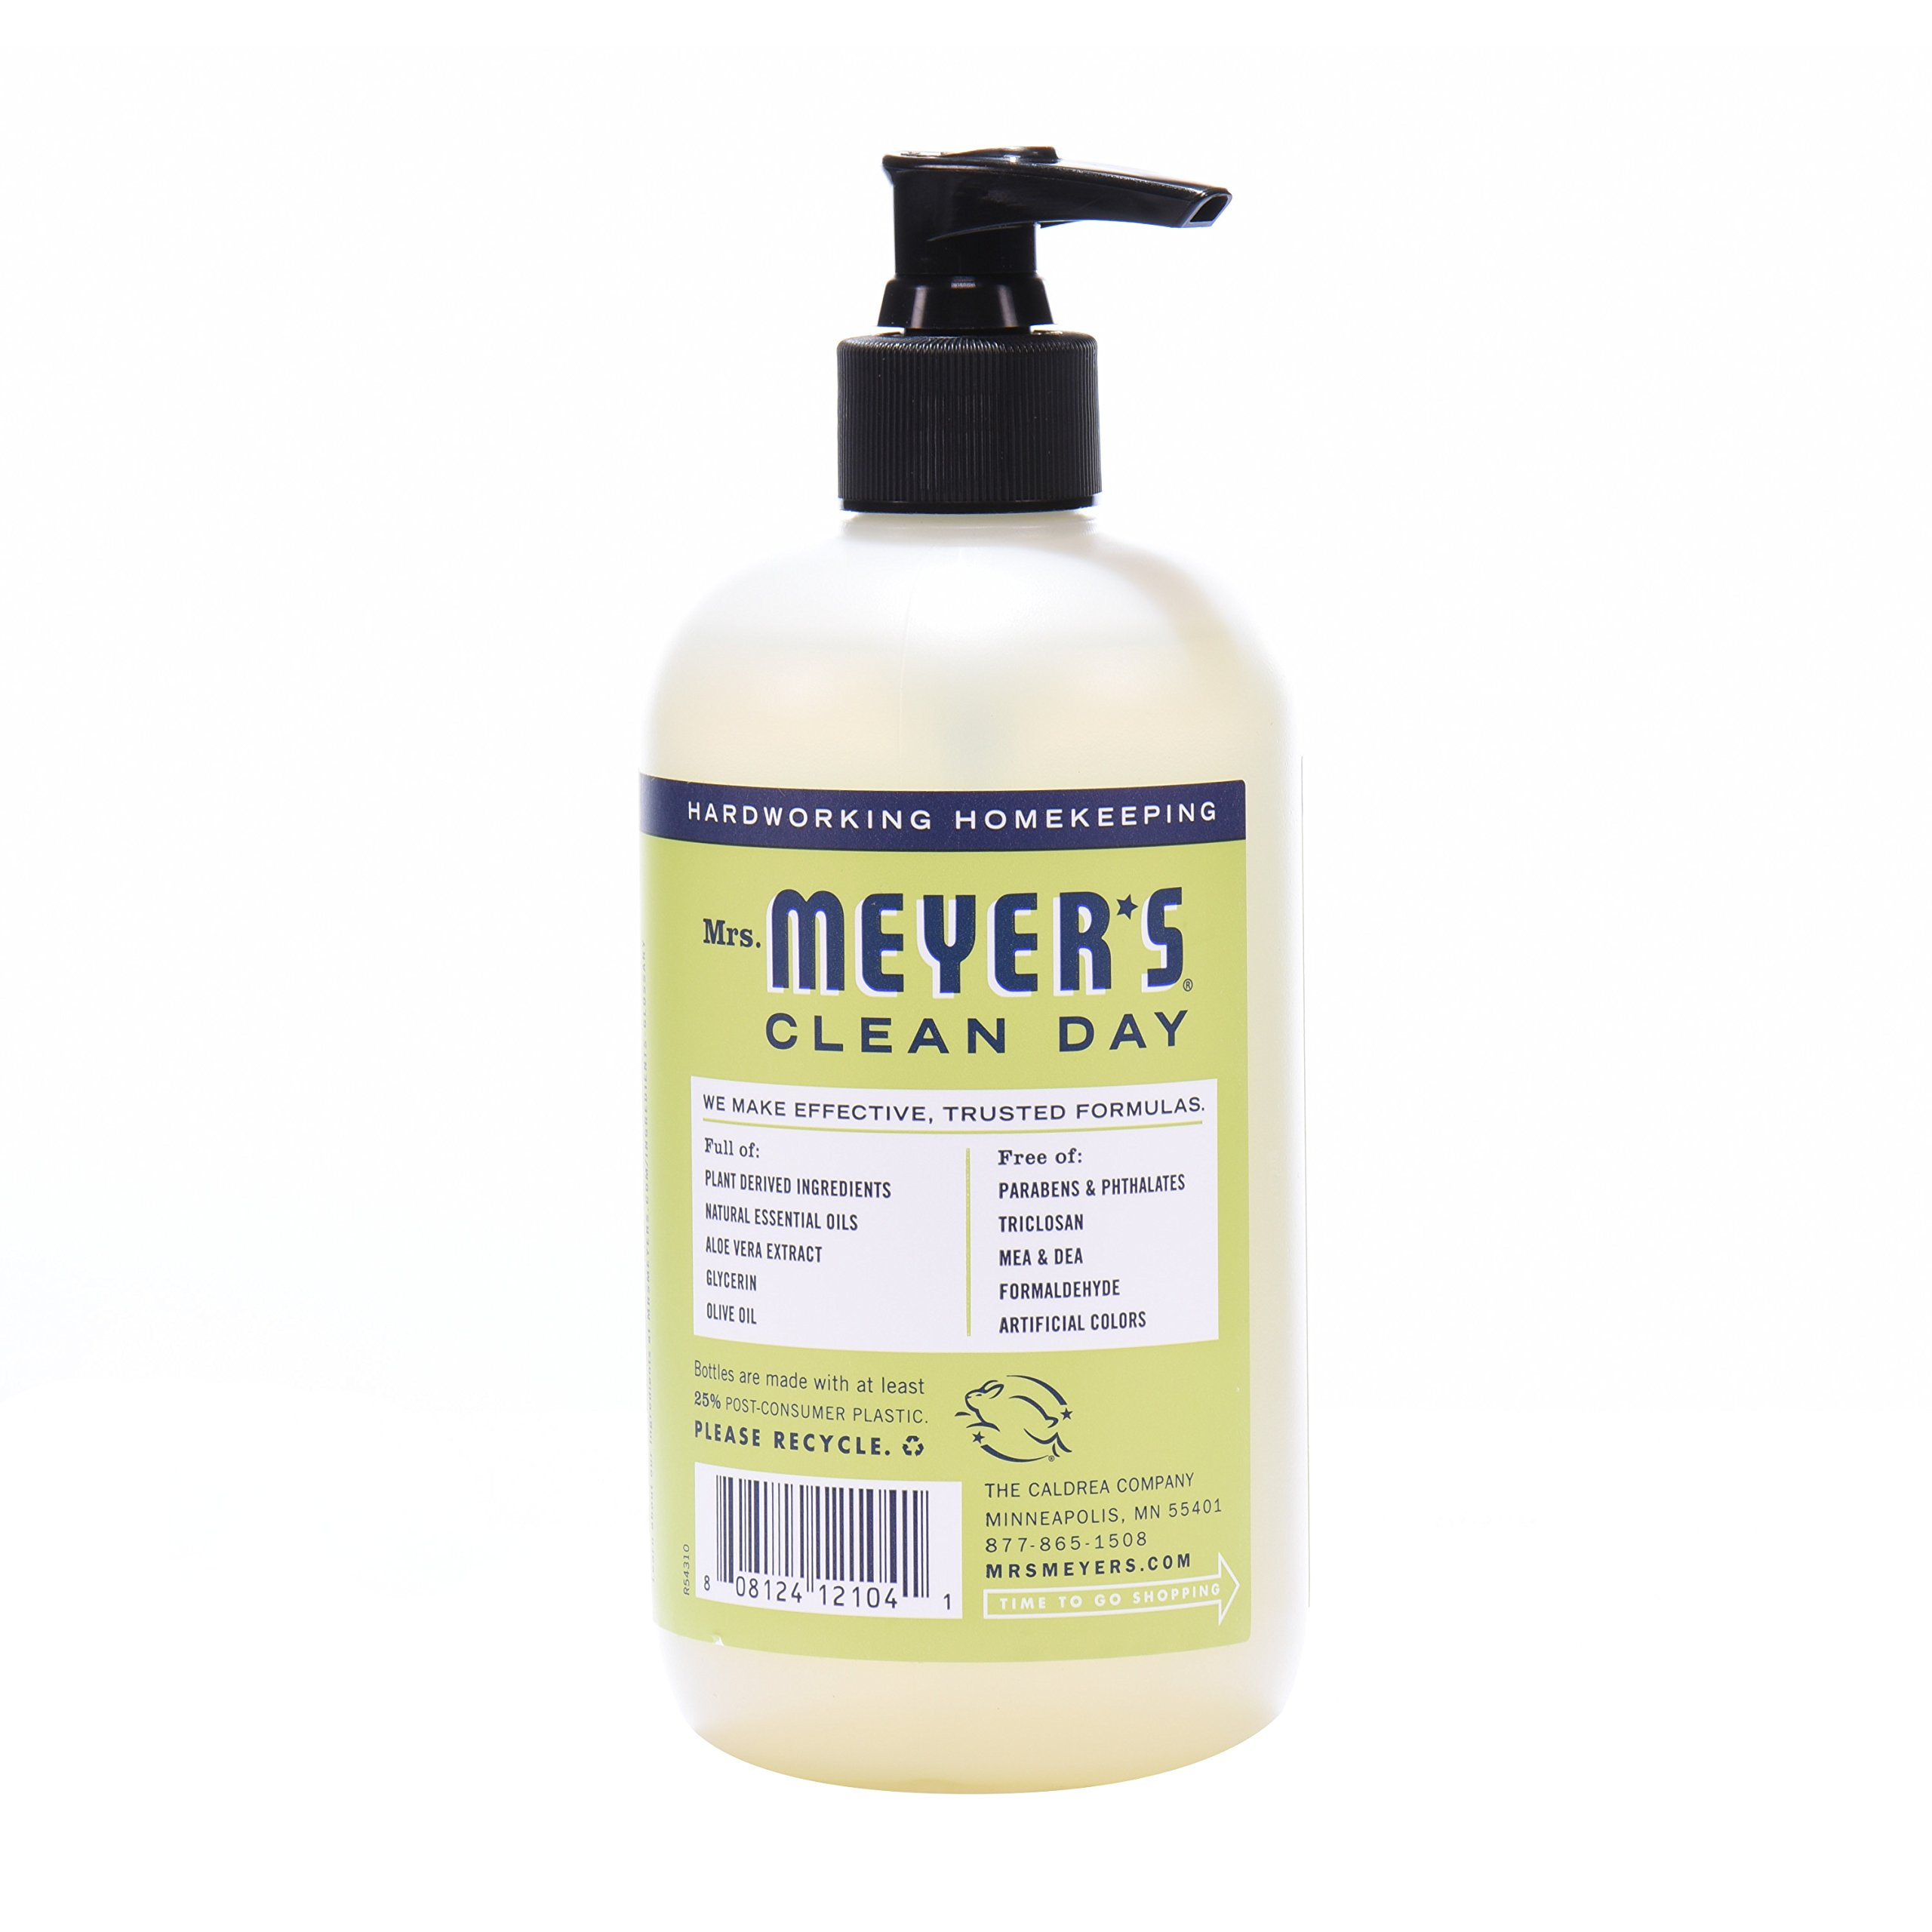 Mrs. Meyer´s Clean Day Hand Soap, Lemon Verbena, 12.5 fl oz, 3 ct by Mrs. Meyer's Clean Day (Image #4)